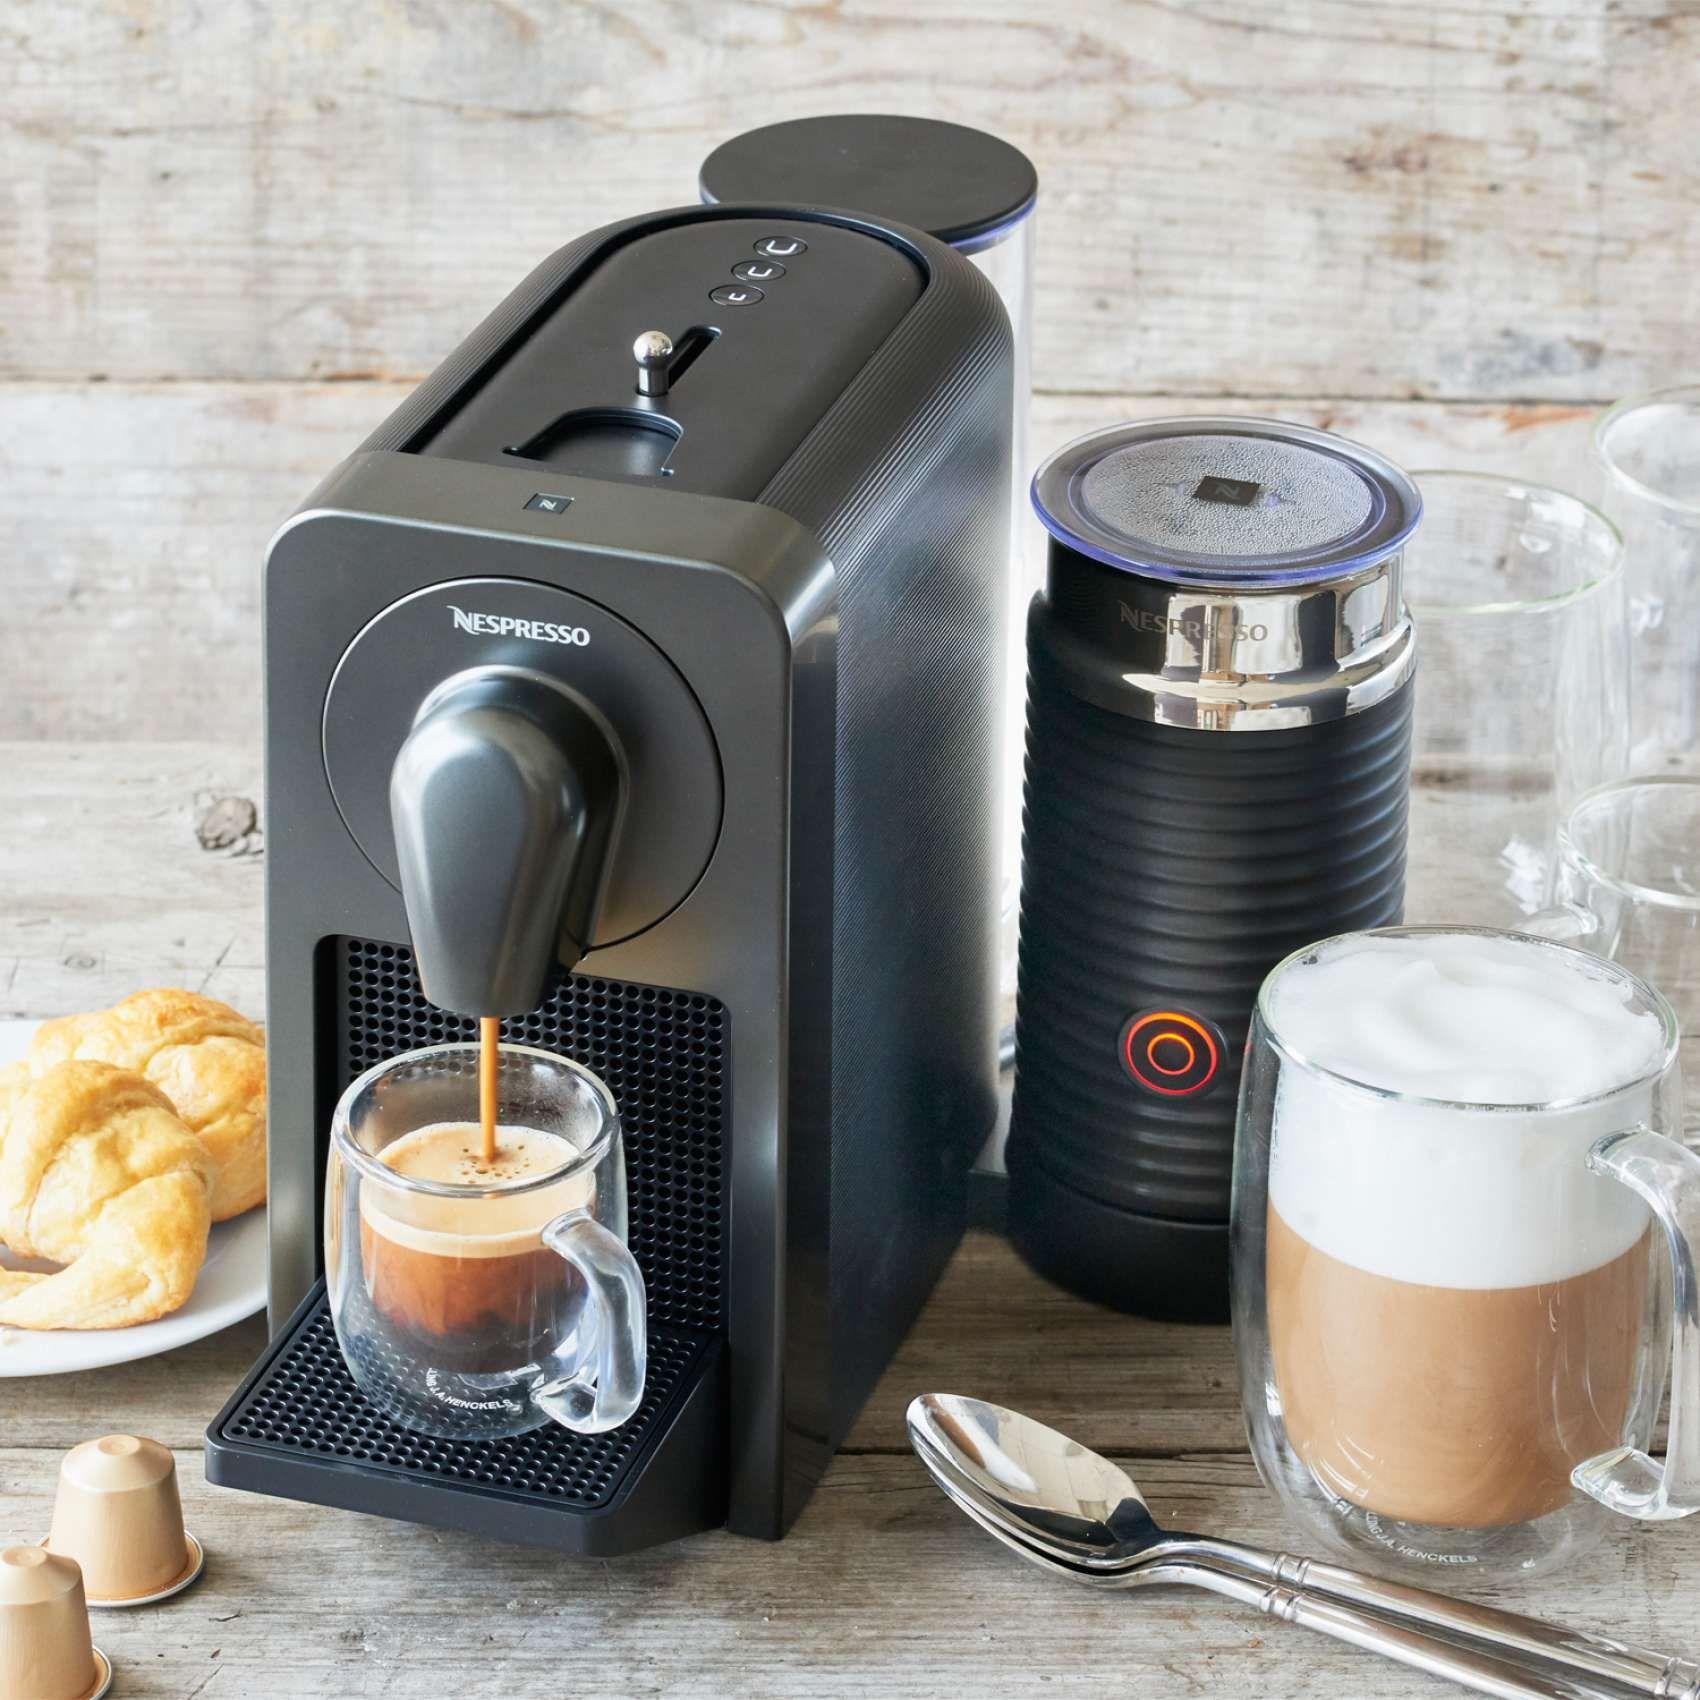 Nespresso Prodigio Espresso Machine with Milk Frother